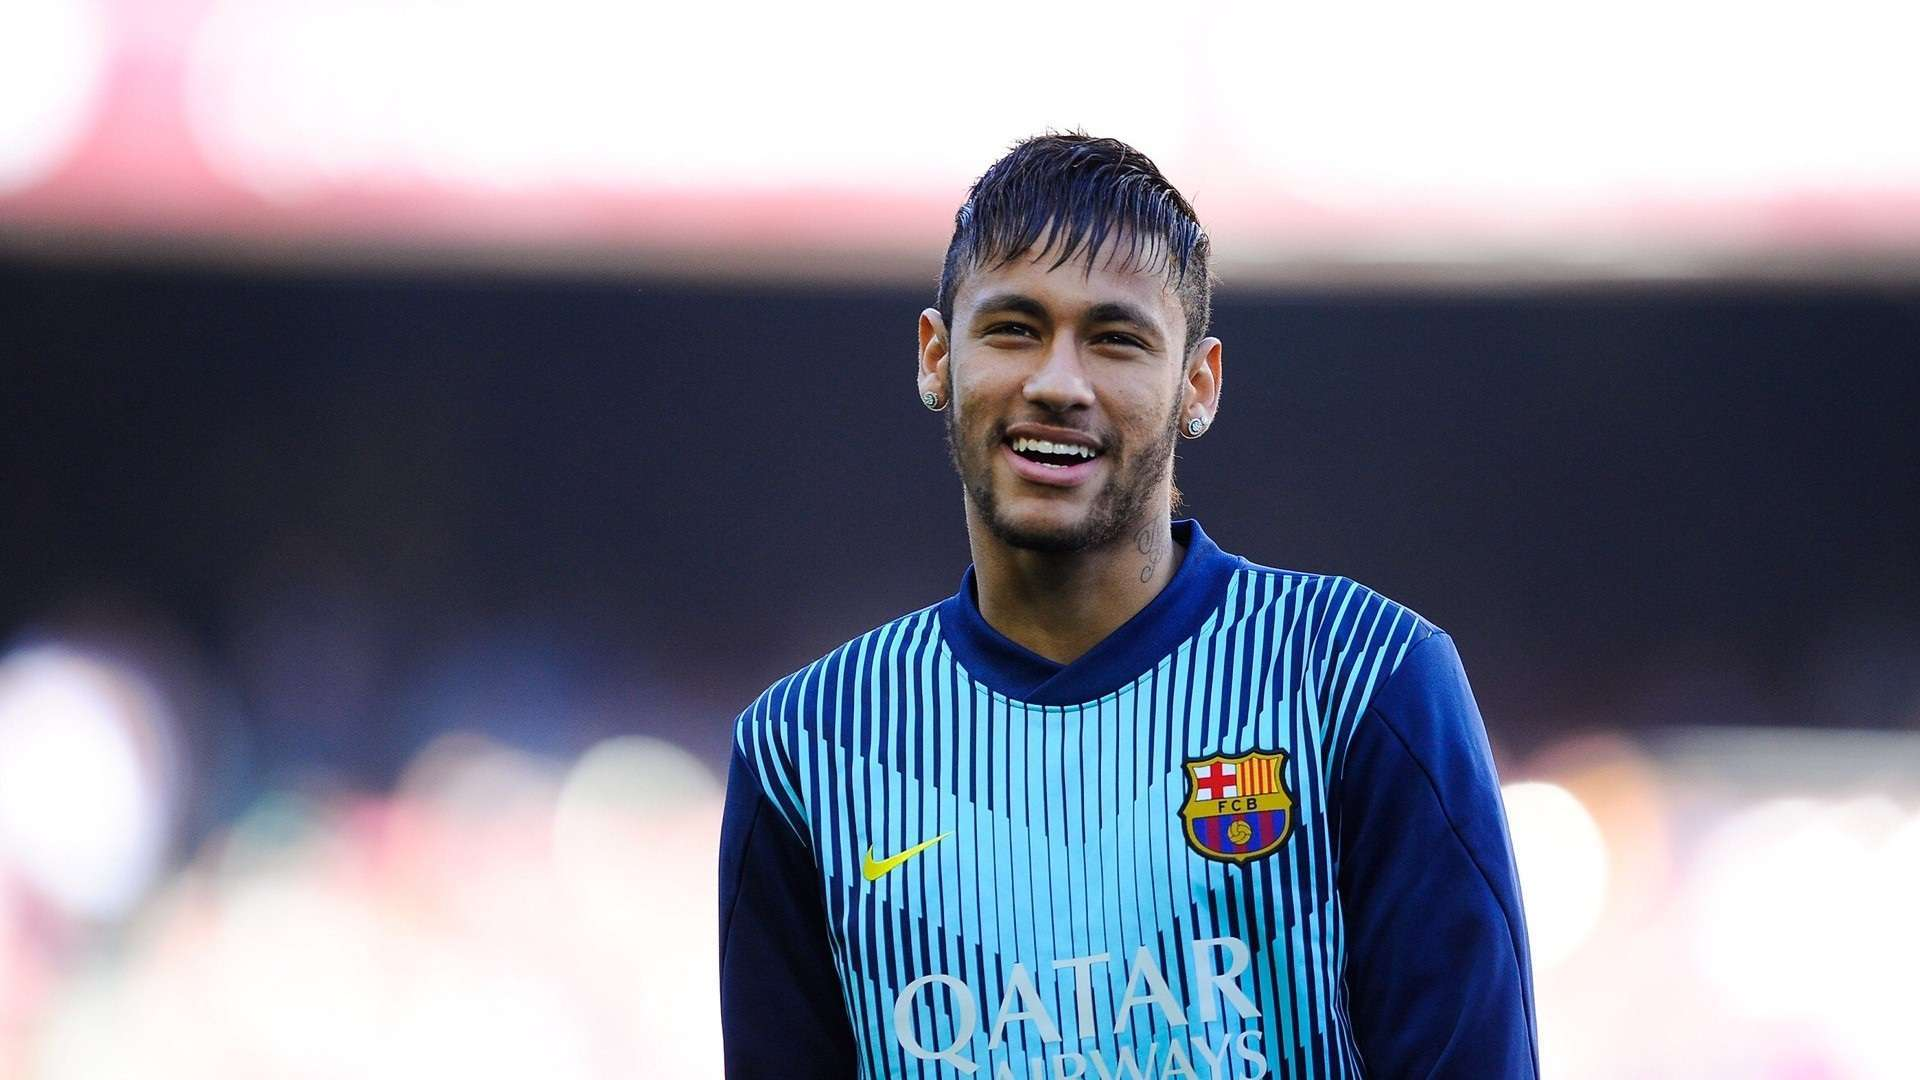 Hd wallpaper neymar - Neymar Backgrounds Download Free Wallpapers Backgrounds Images